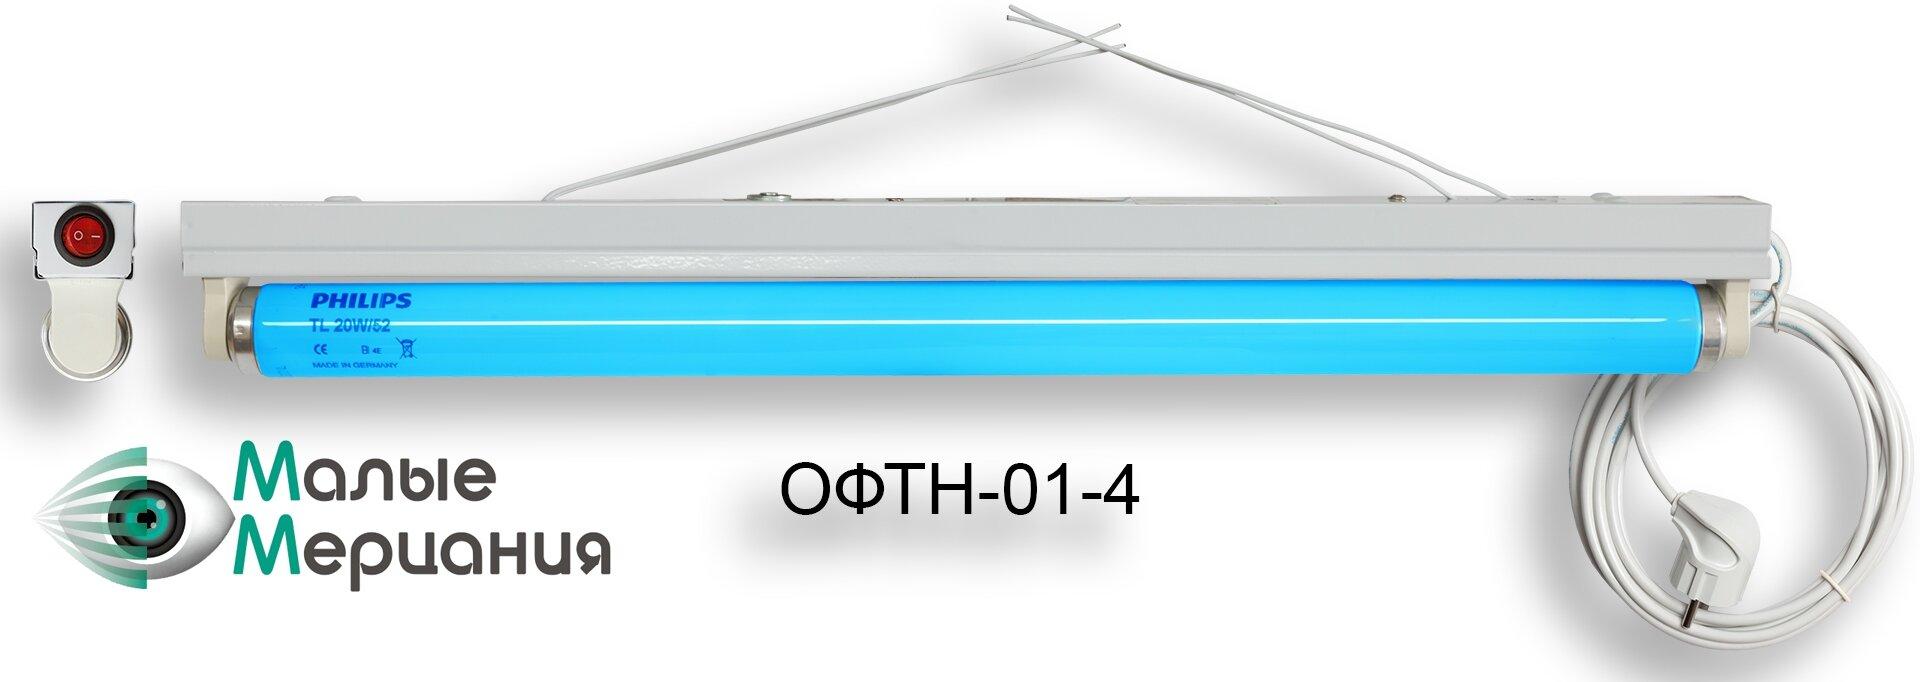 Фотолампы от желтушки - фото ОФТН-01-4 БМ.jpg